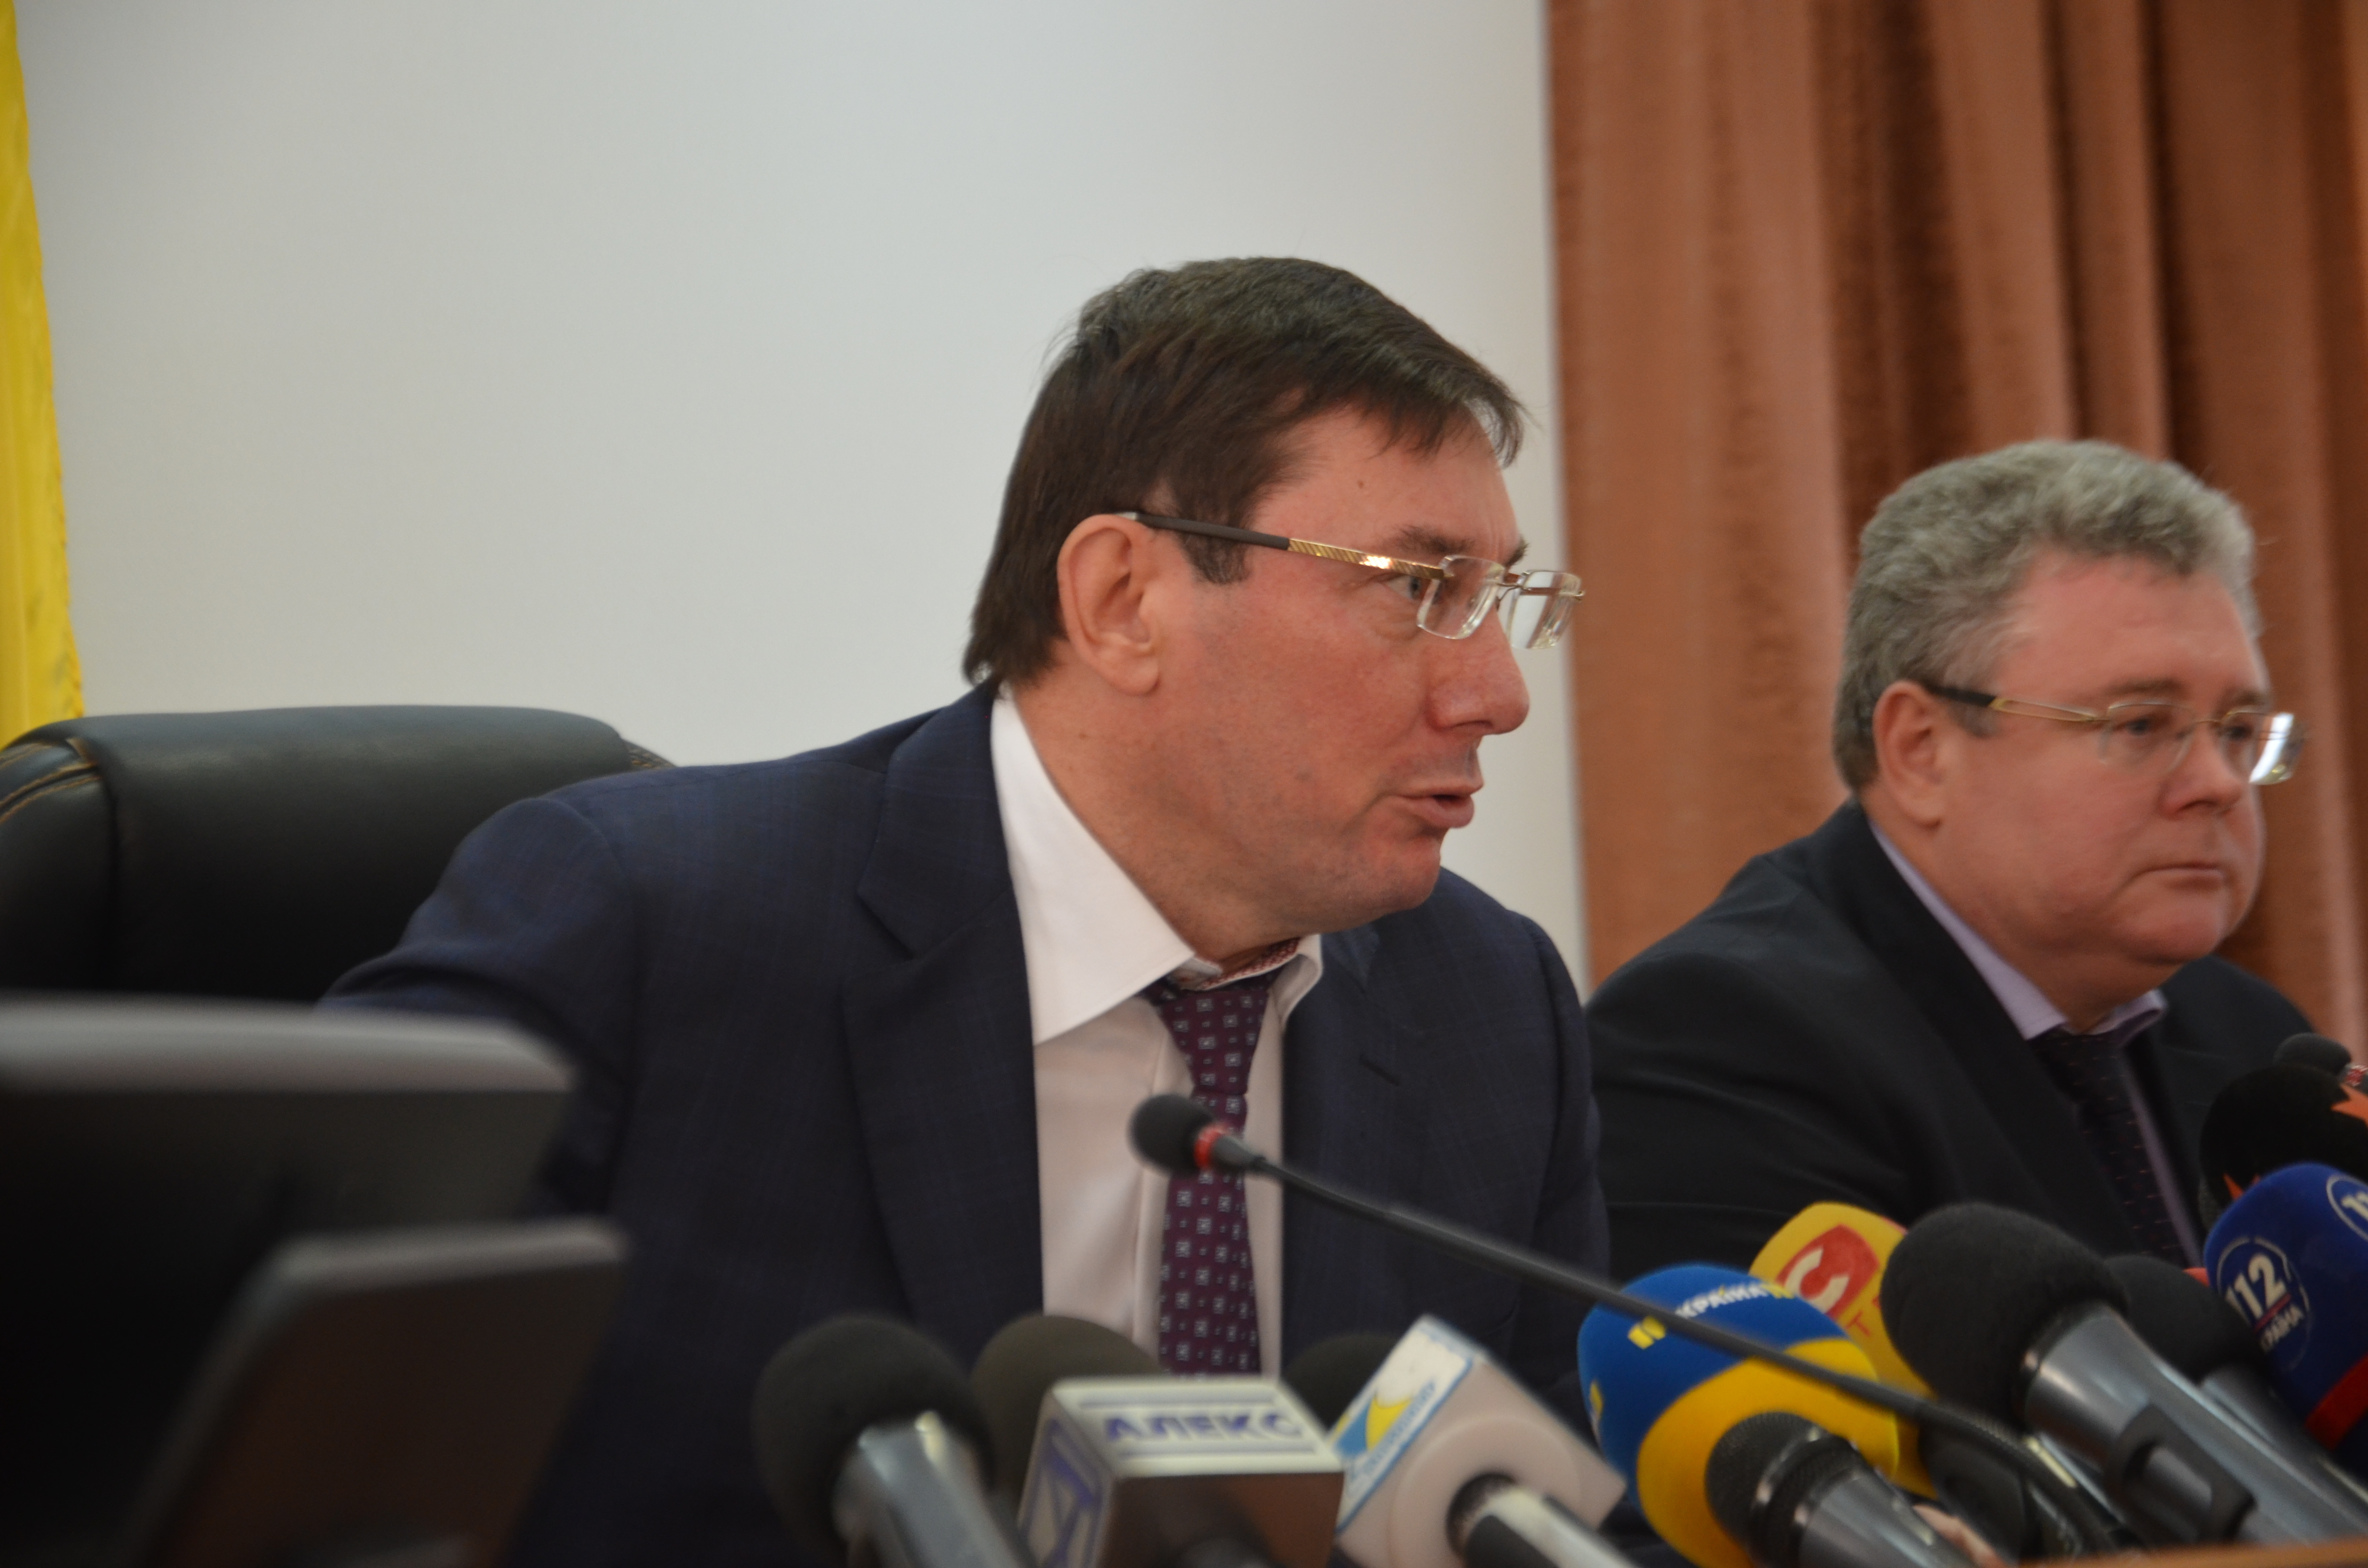 В Запорожье приехал генпрокурор Украины Юрий Луценко: экс-мэра Александра Сина объявили в розыск - ФОТО